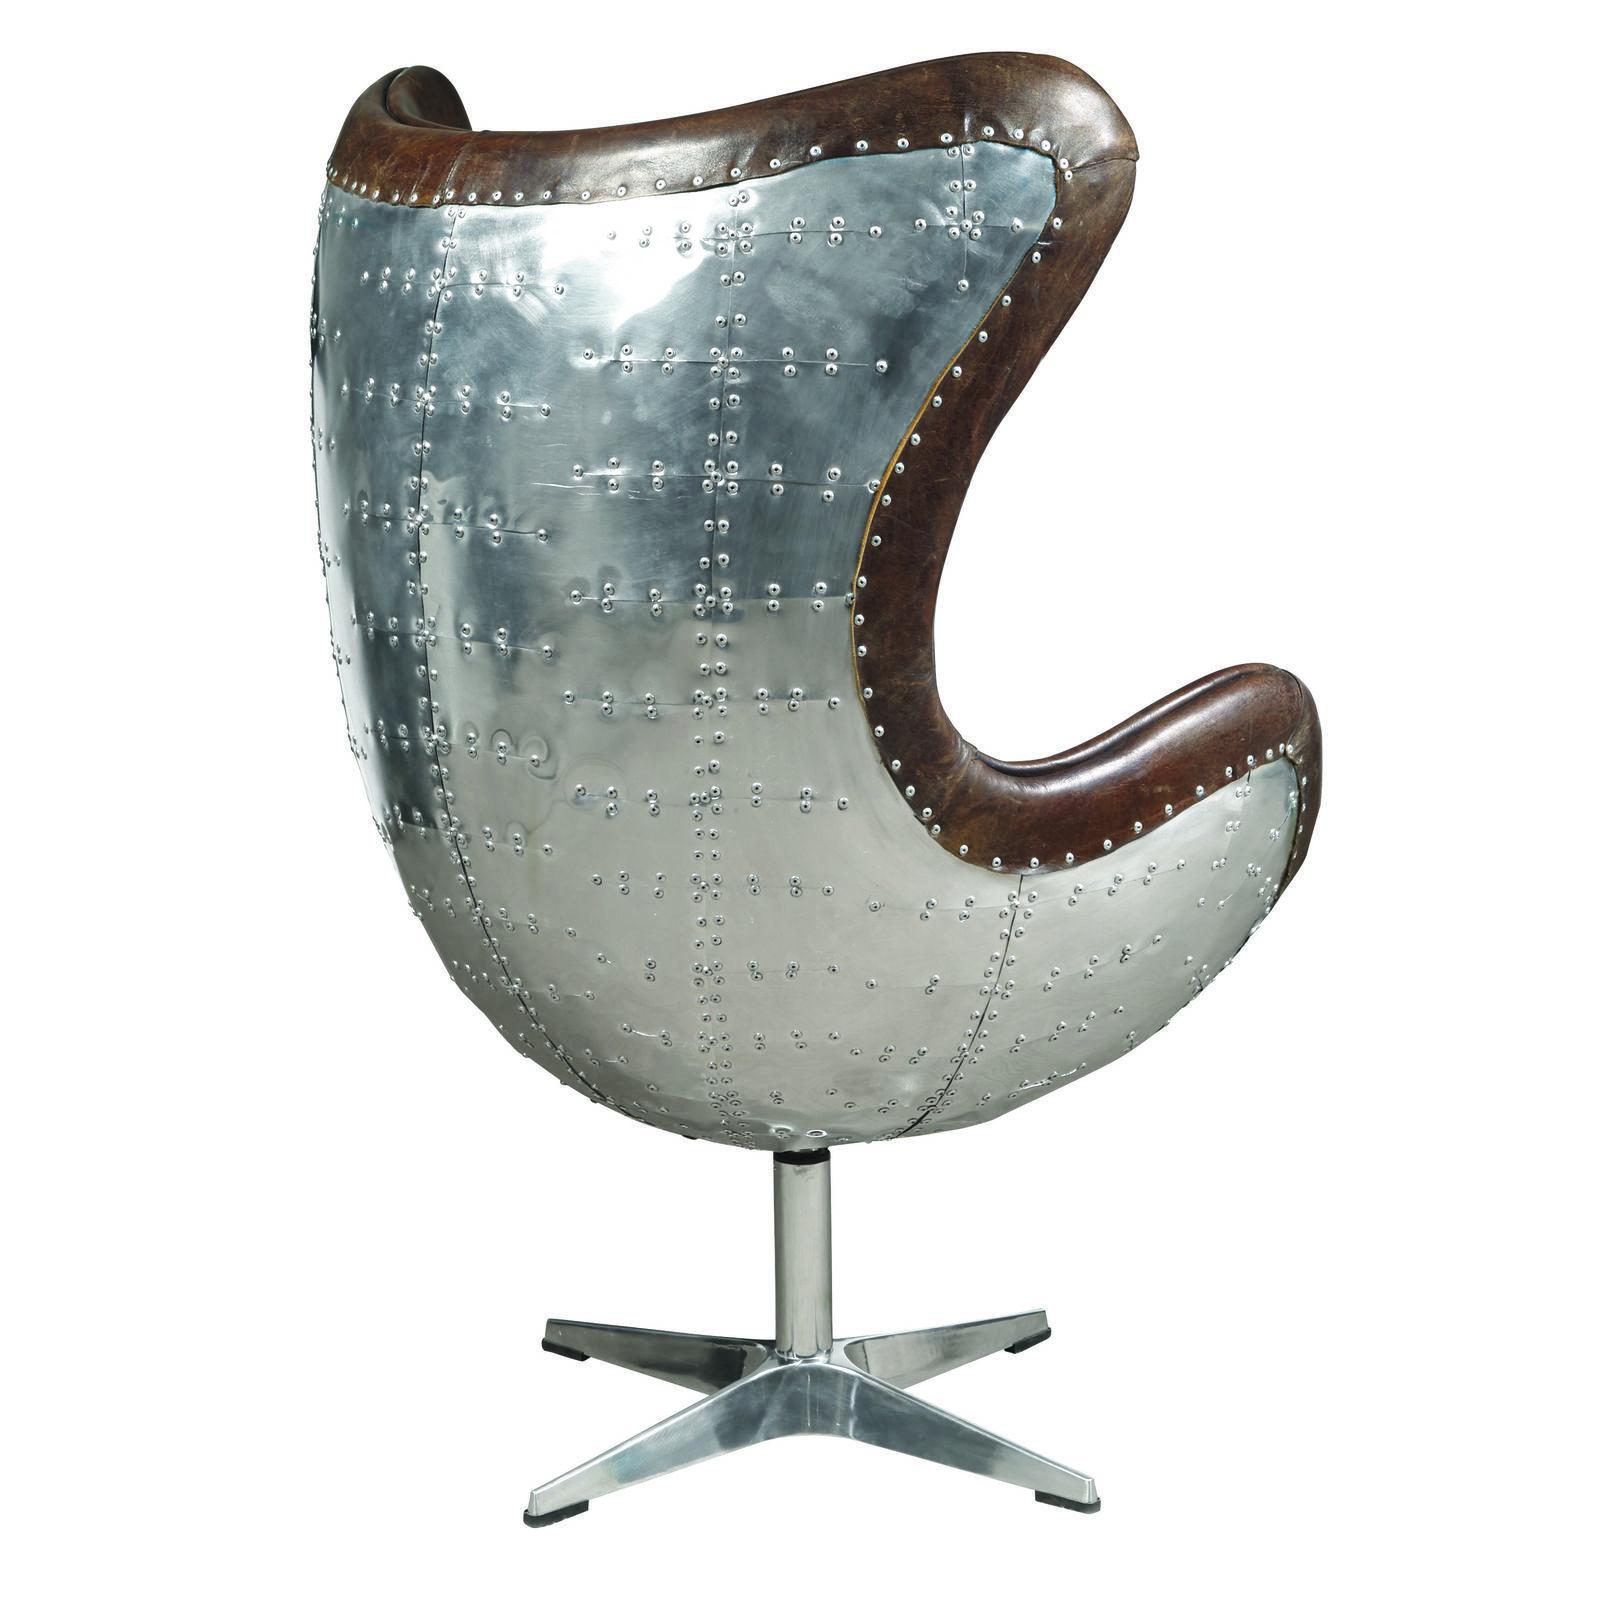 Fabulous Modern Cuba Brown Leather  Swivel Egg  Chair,32'' x 46''H.